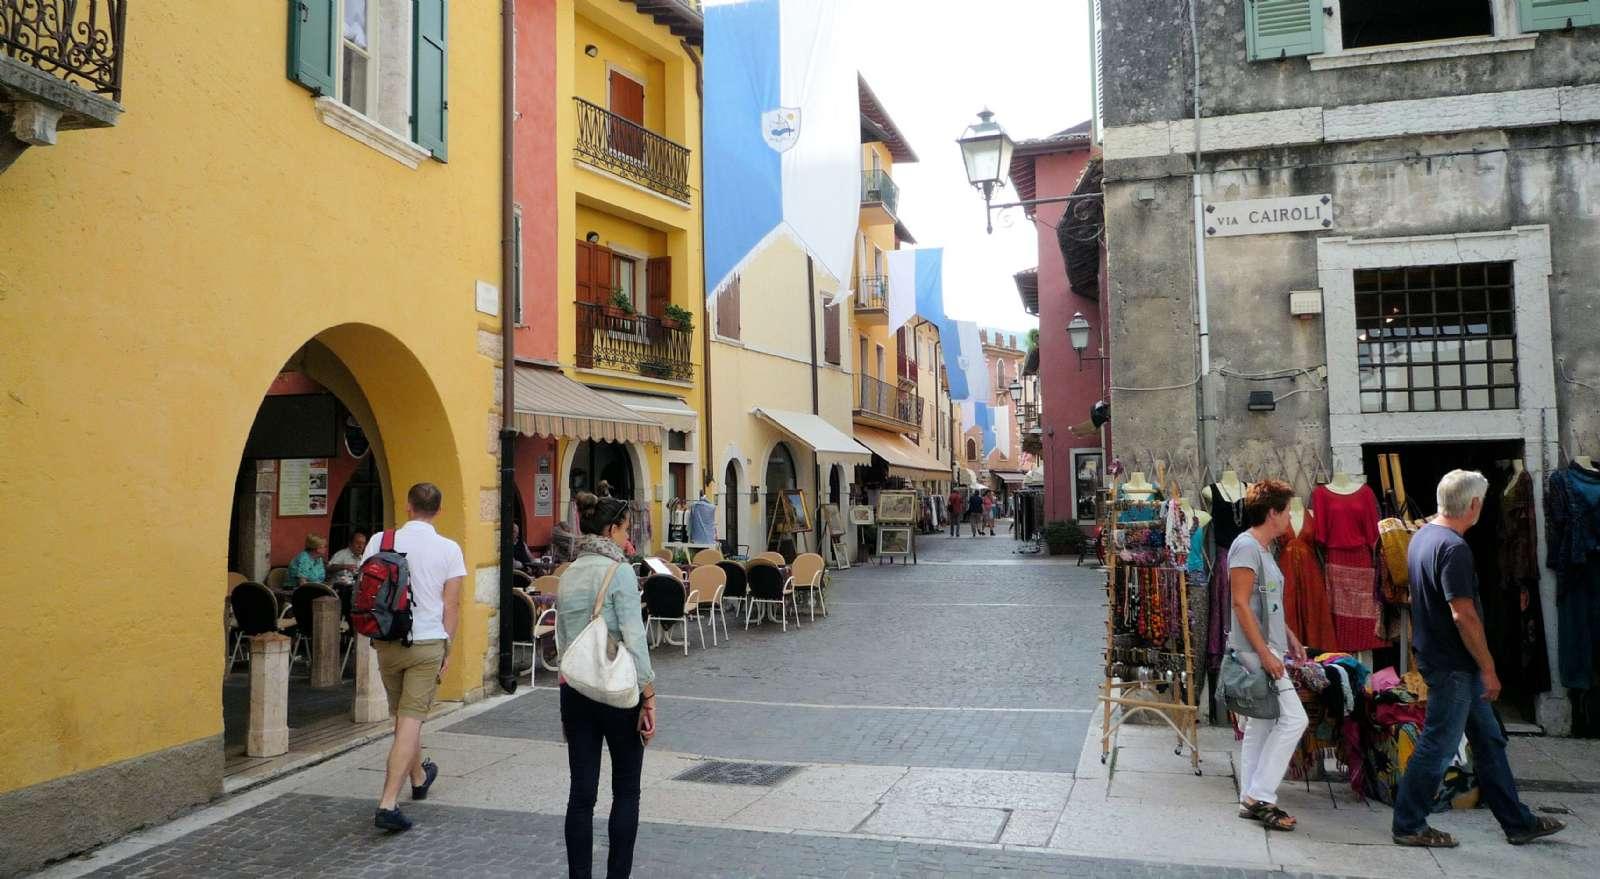 Gågaden fra Piazza Chiesa mod Piazza Calderini